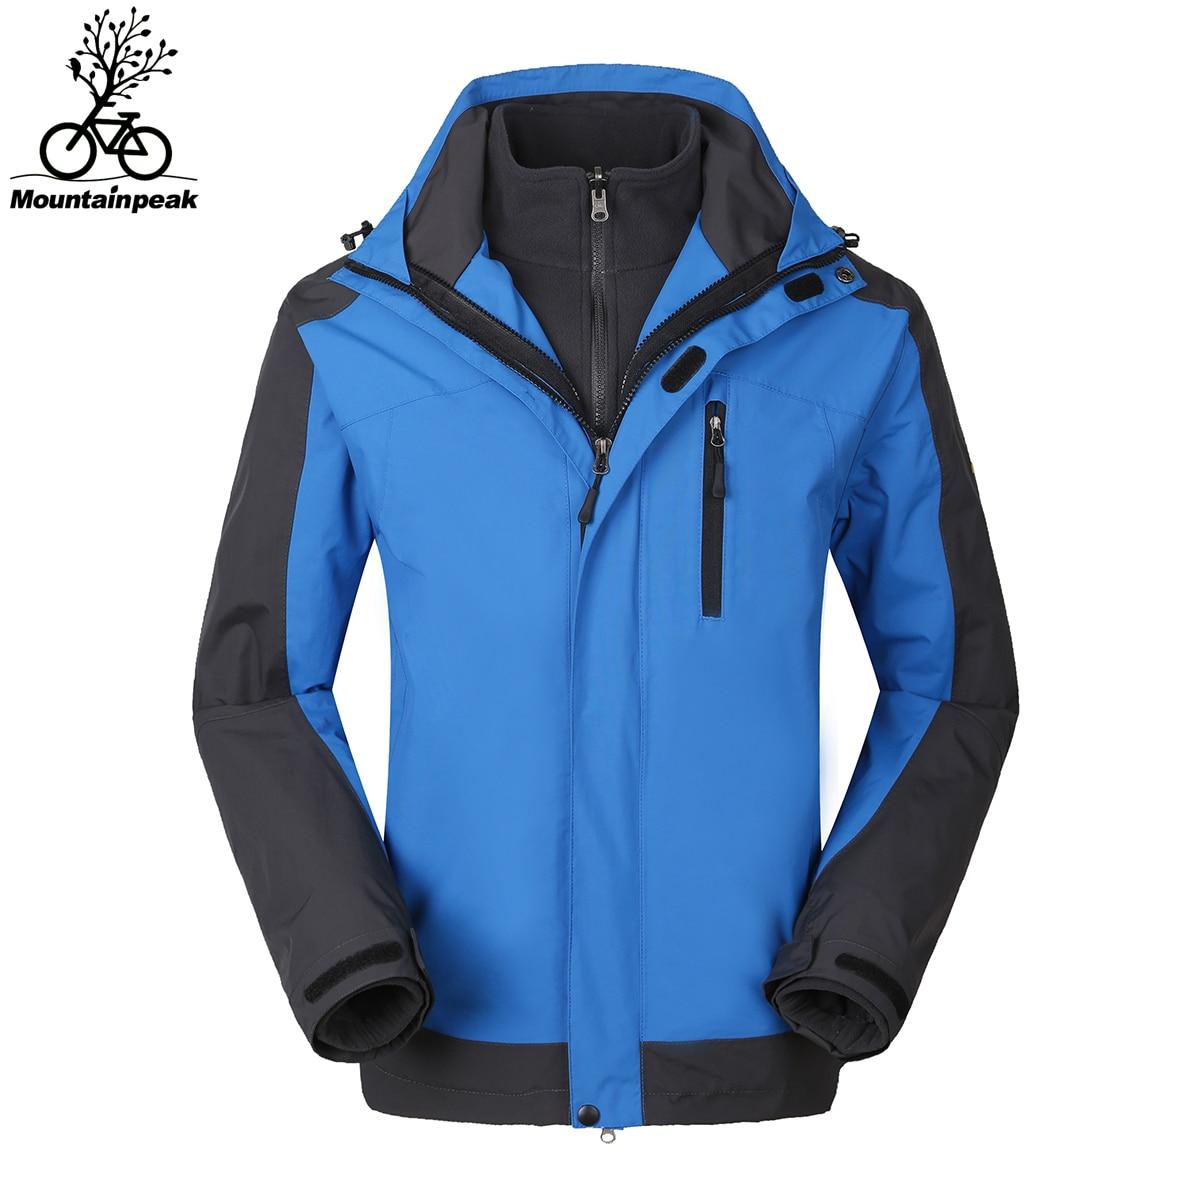 Mountainpeak Riding Coat Outdoor Hiking Jackets Waterproof Cycling Jersey Warm Coat Jacket Climbing Jacket Men Pizex Sportswear